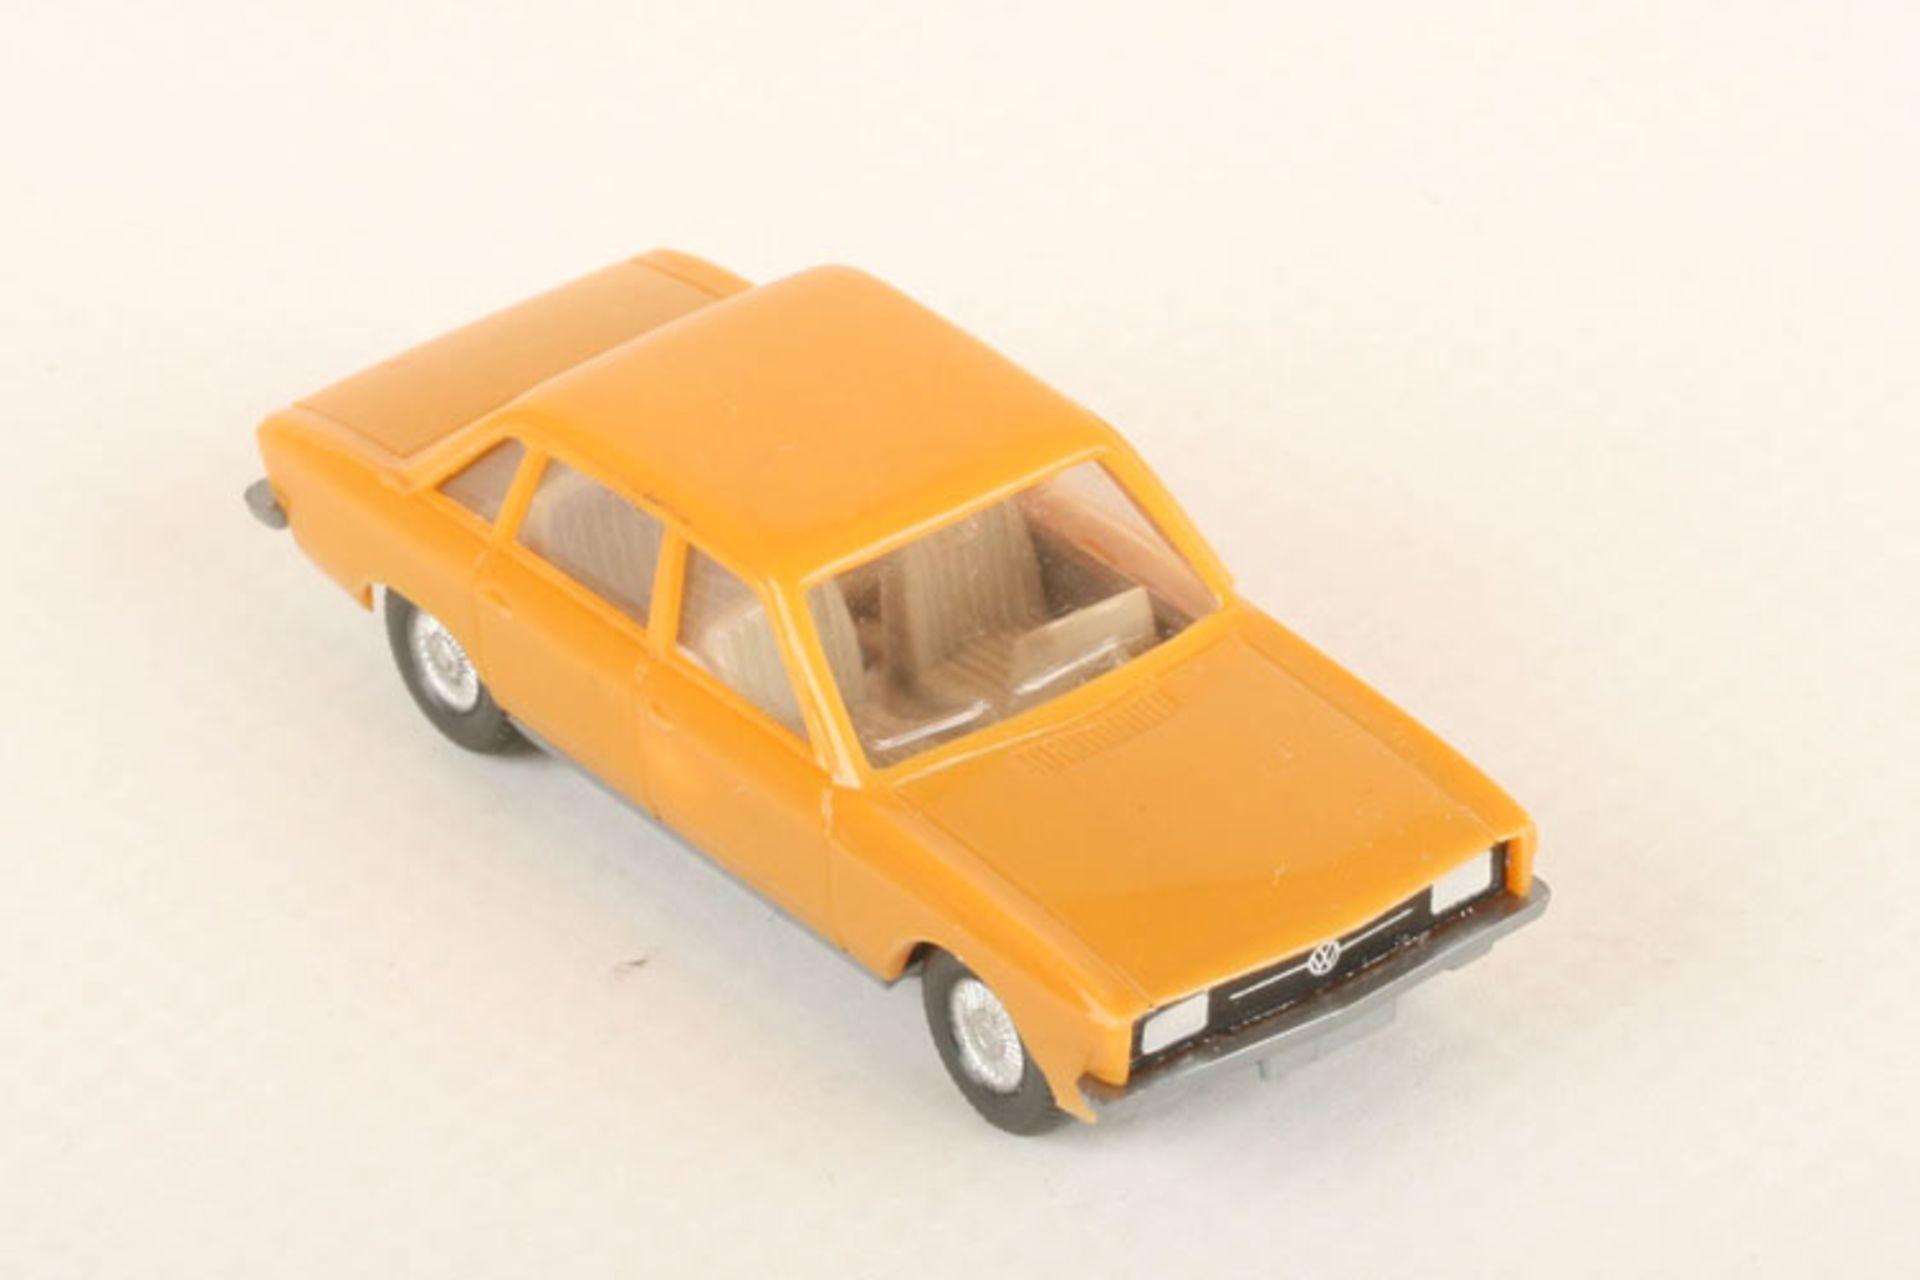 Los 1043 - Wiking VW K 70 senfgelb 47/2d, neuwertig